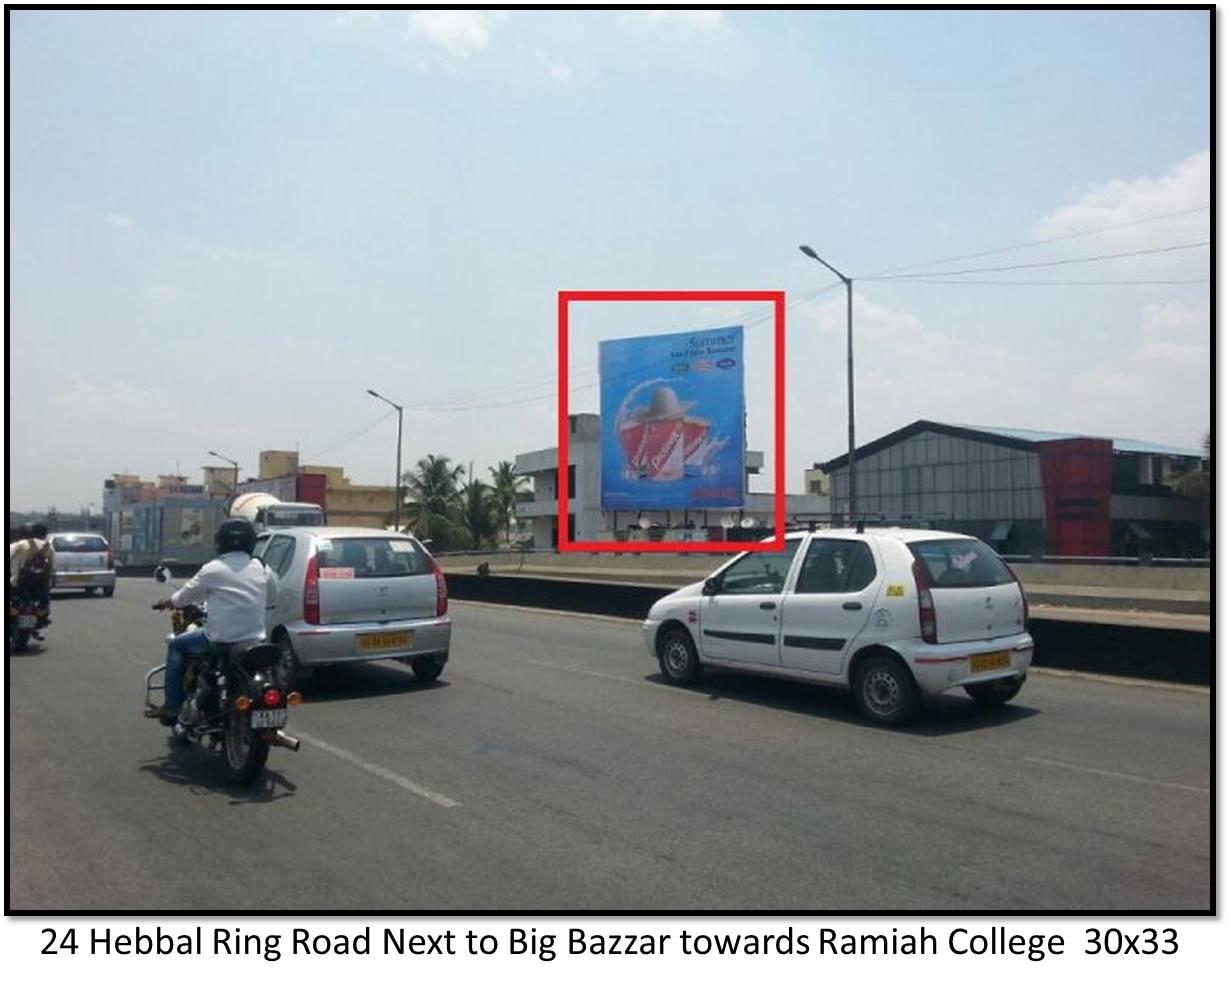 Hebbal Ring Road Next to Big Bazzar, Bengaluru